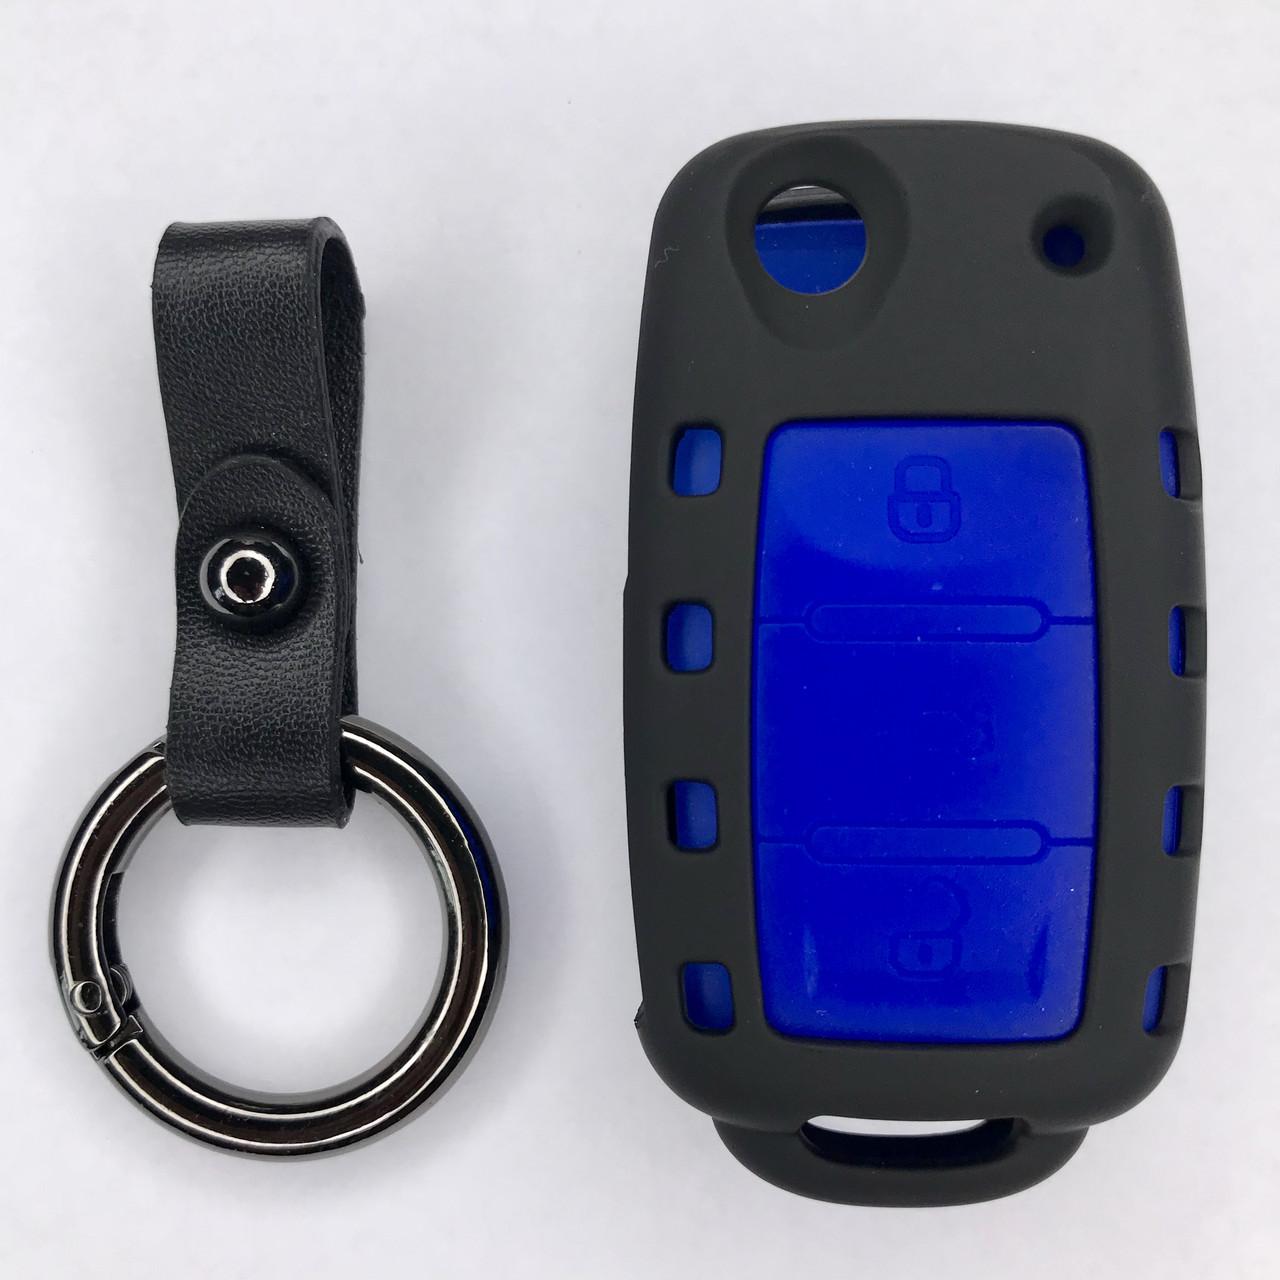 Матовый чехол для ключа Volkswagen Passat,Golf,Tiguan,Touareg,Polo, Jetta,Amarok,Beetle,Bora,Сaddy,Passat